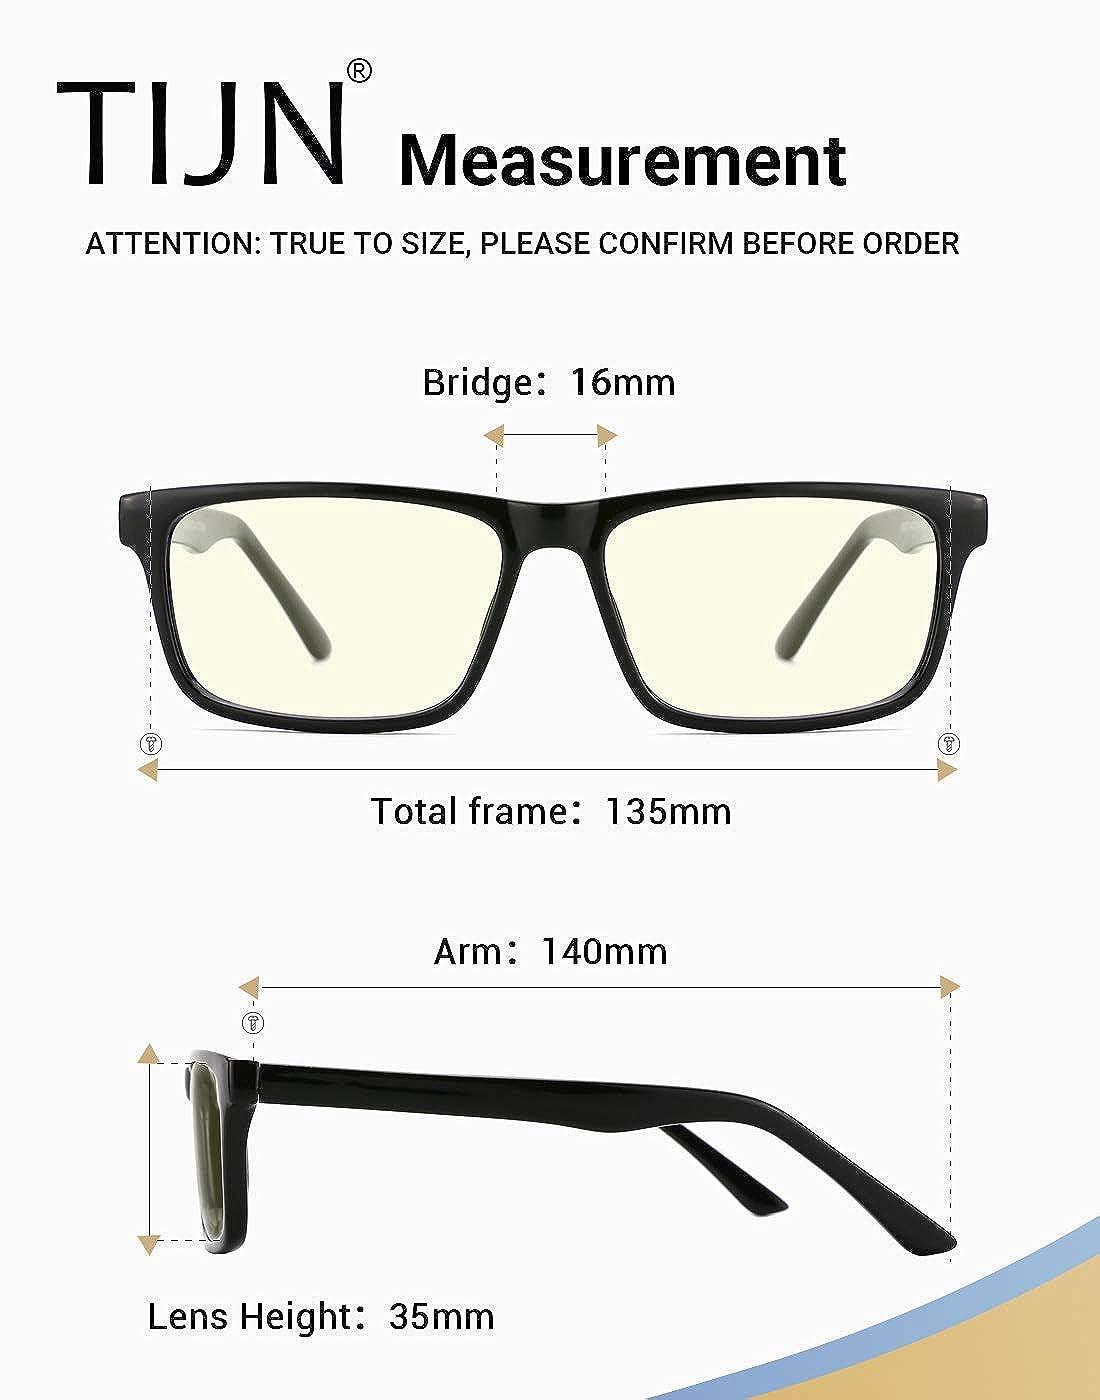 96fab1b403b9 Amazon.com: TIJN Anti UV Glare Blue Light Blocking Reading Glasses Square  Eyeglasses for Men Women: Clothing